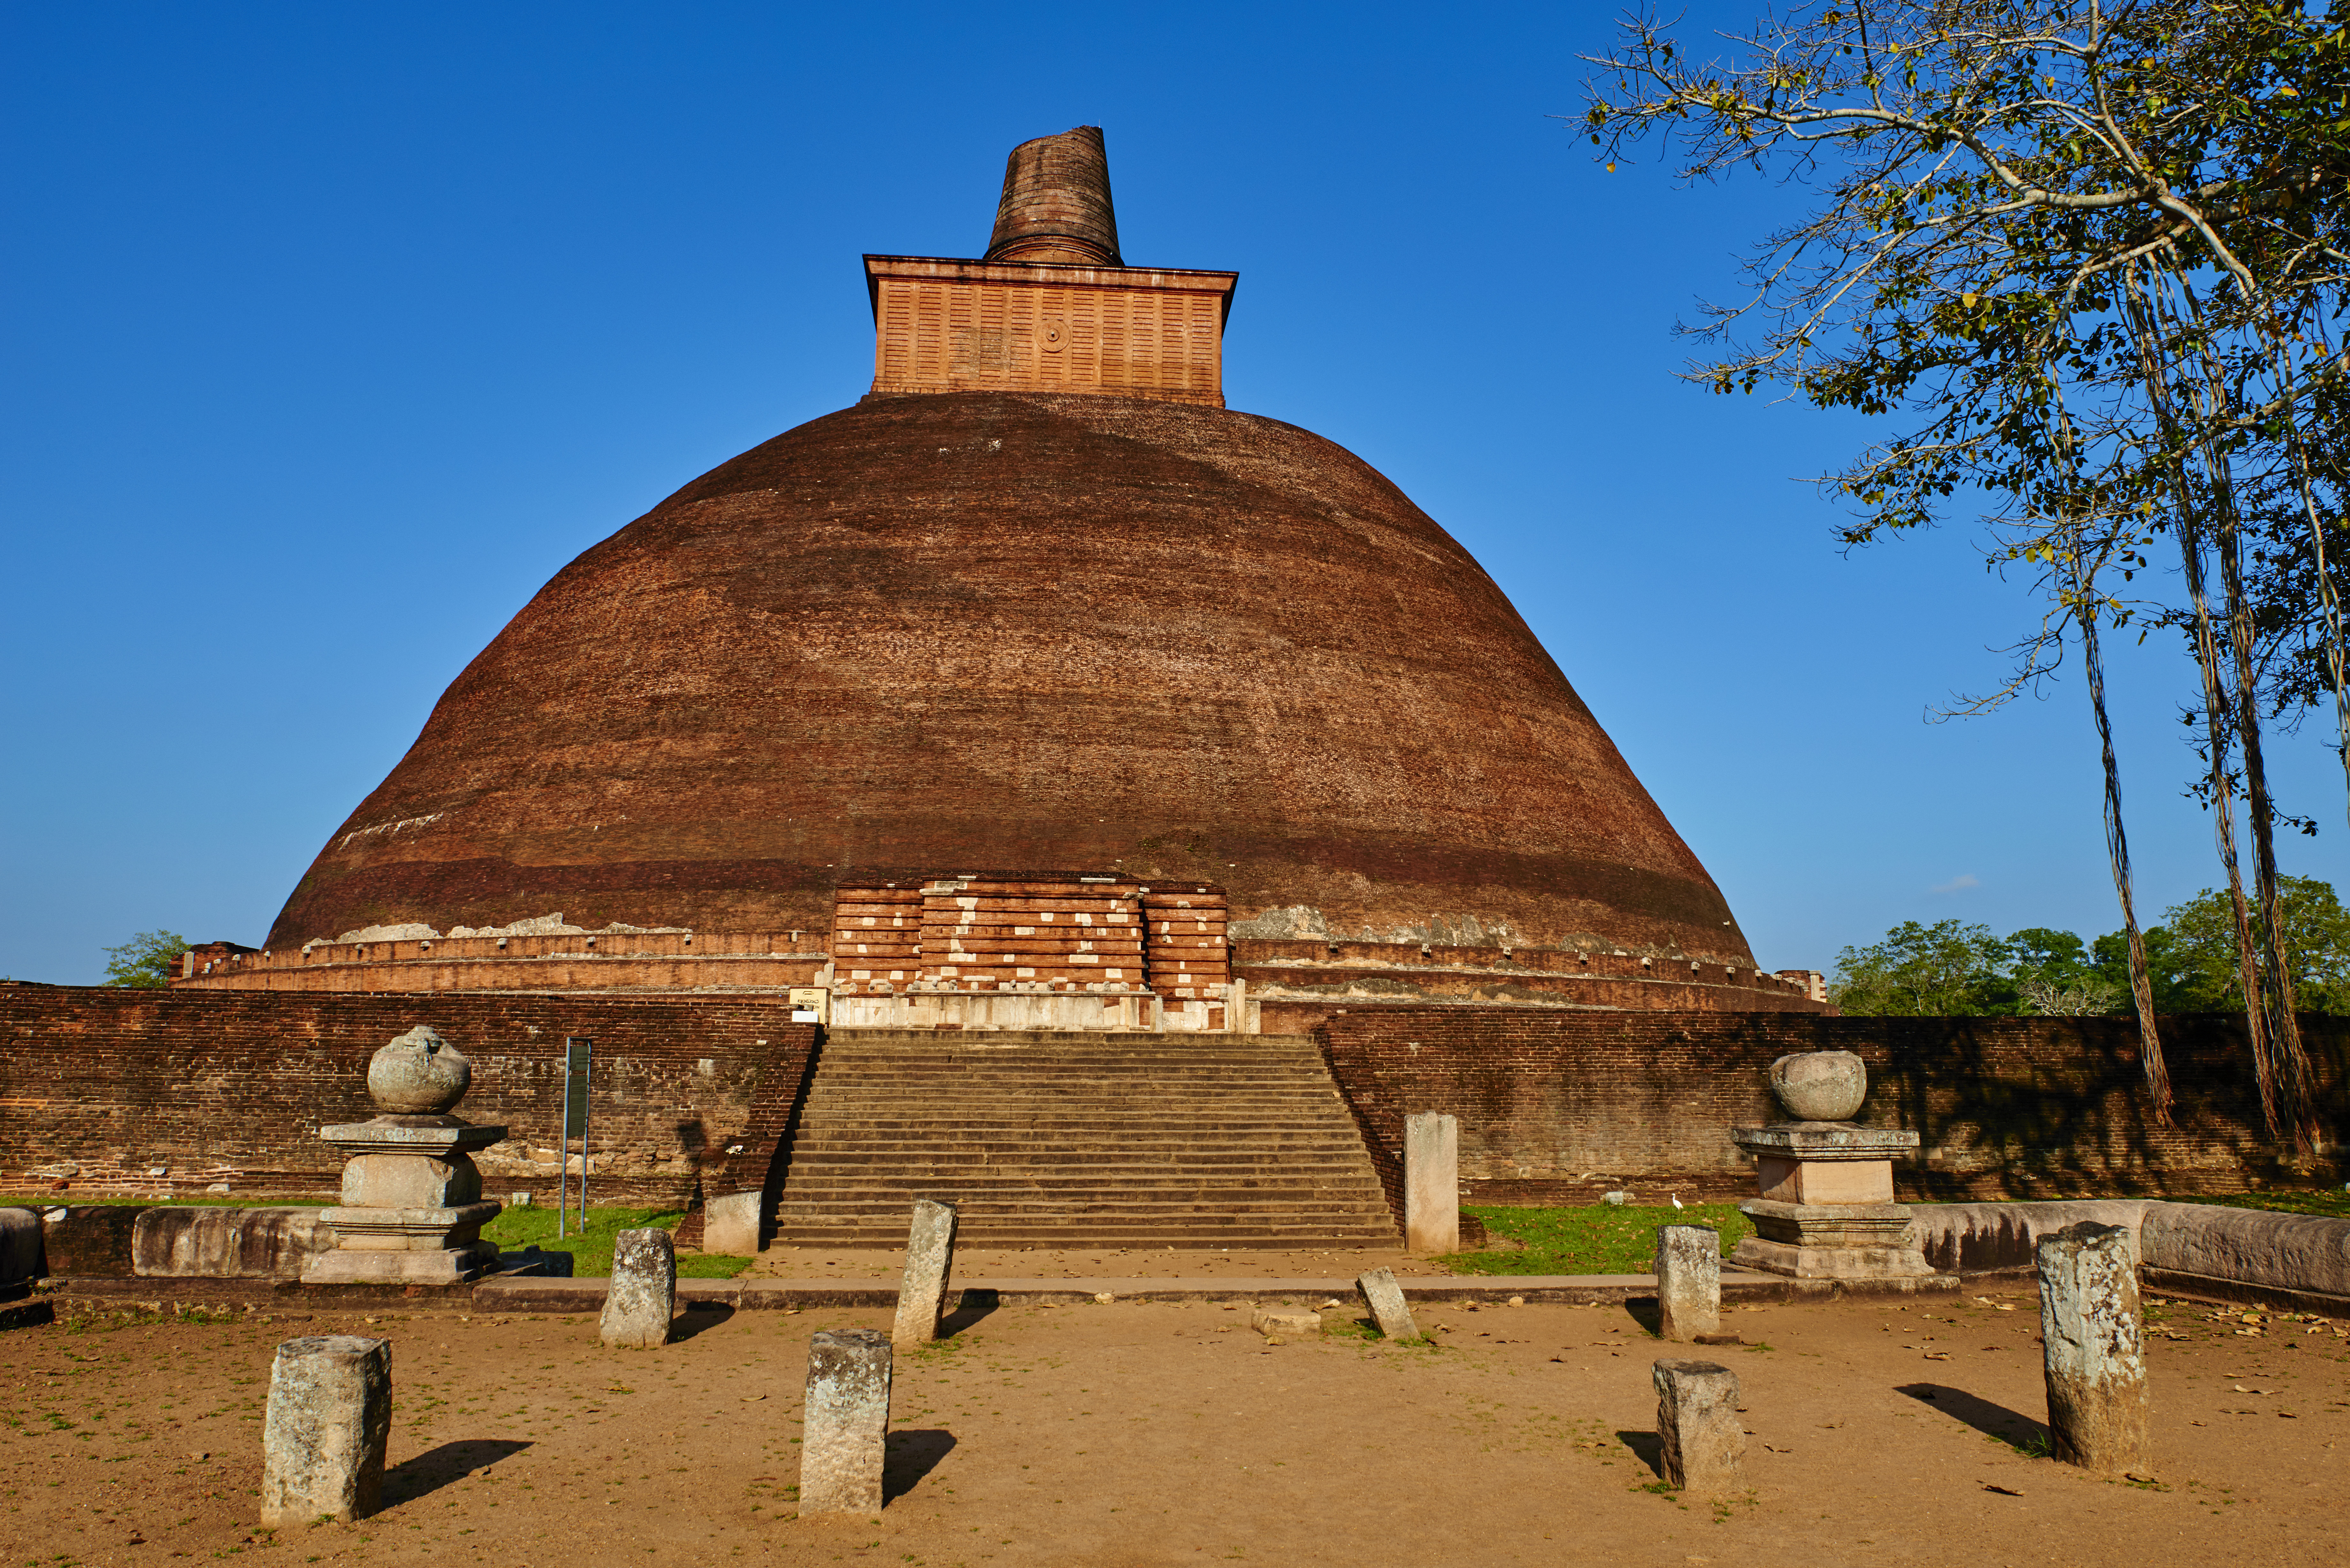 Sri Lanka, Anuradhapura, Abhayagiri temple